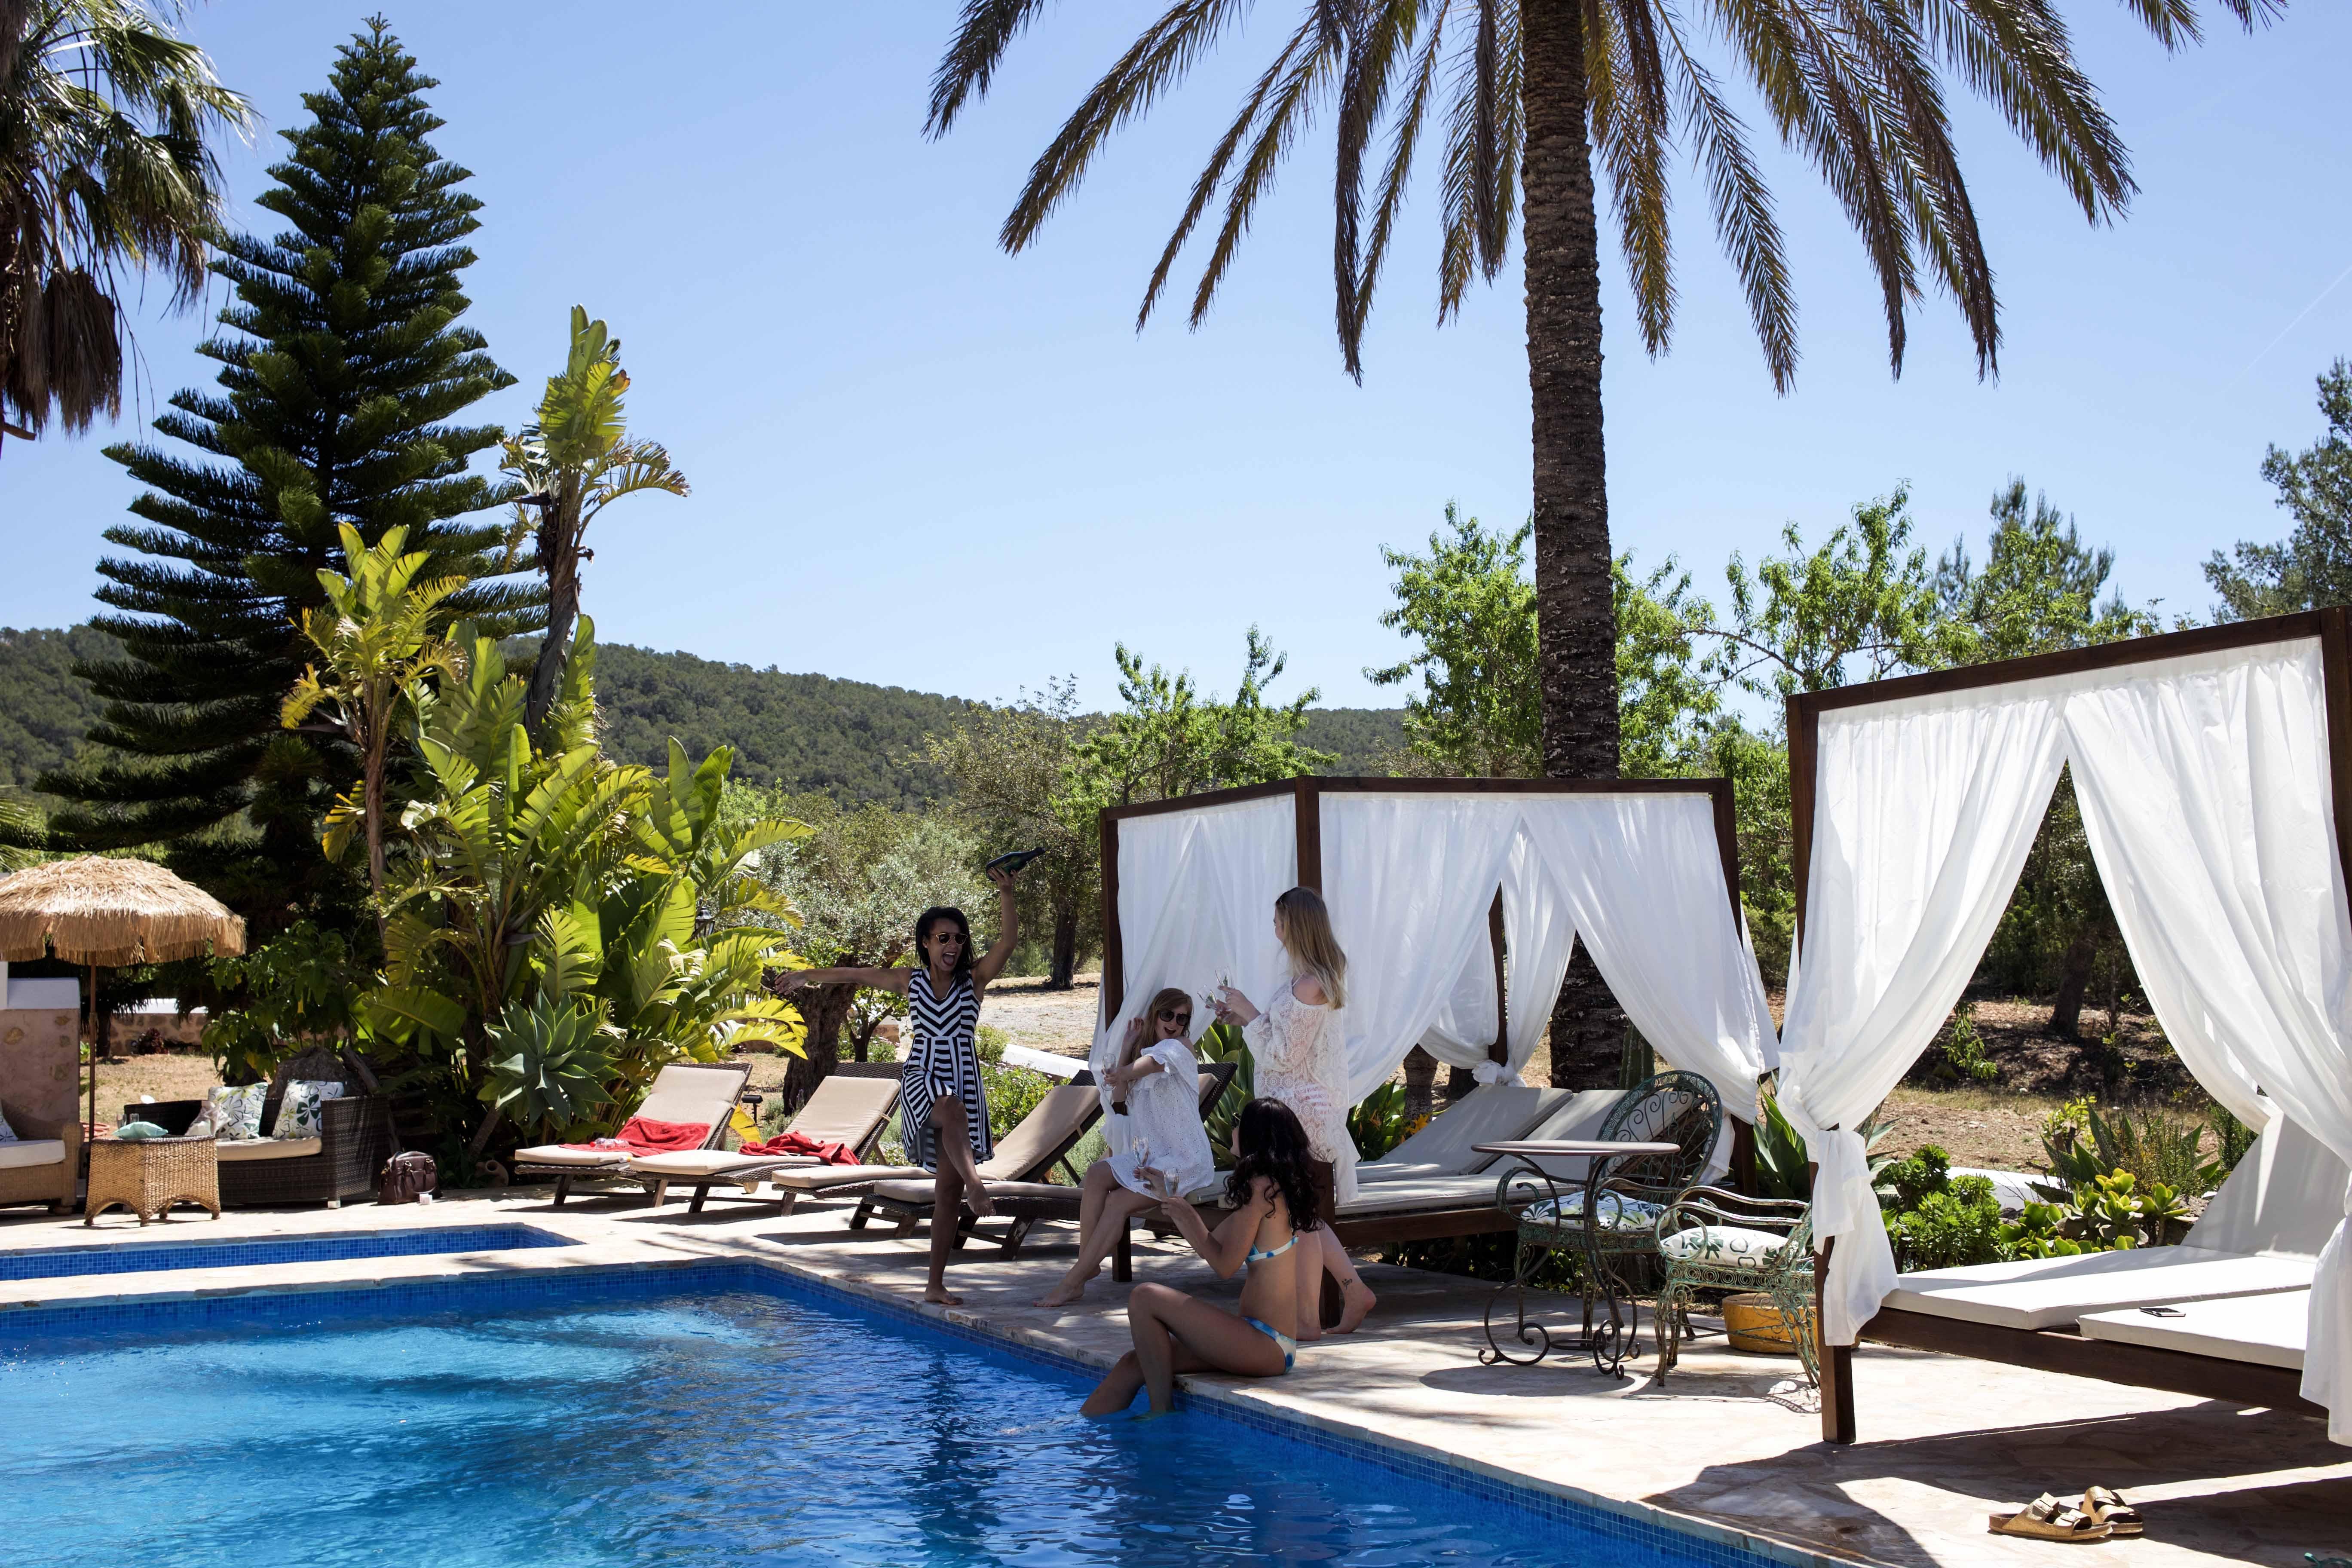 travelblog-reiseblog-ibiza-kurztrip-mädelstrip-luxus-villa_9298